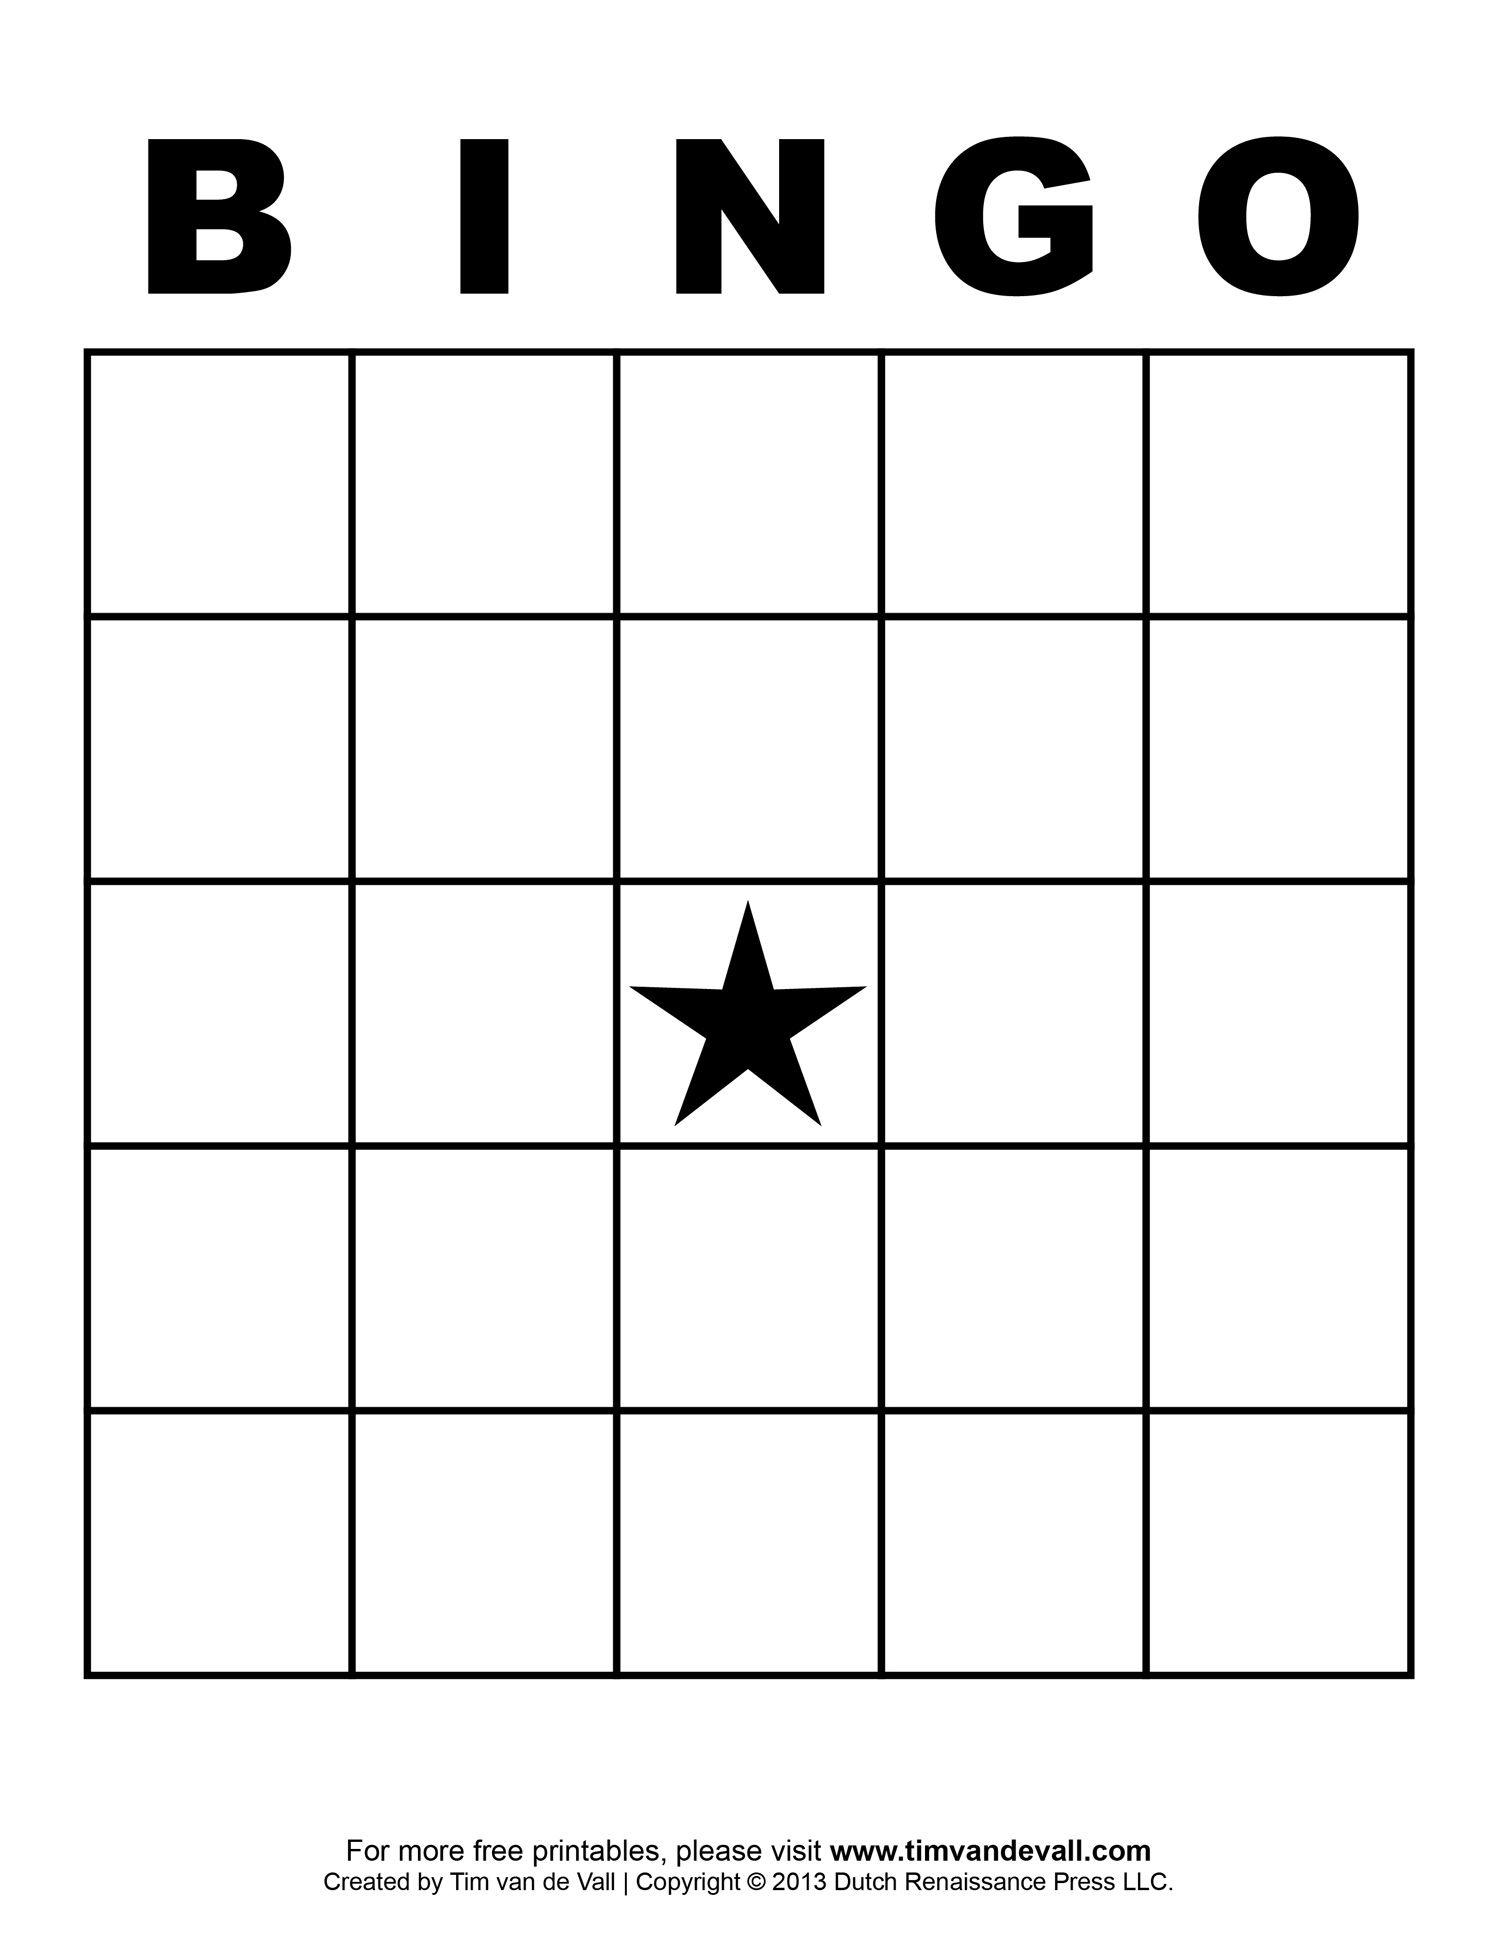 Free Printable Blank Bingo Cards Template 4 X 4 | Free Bingo